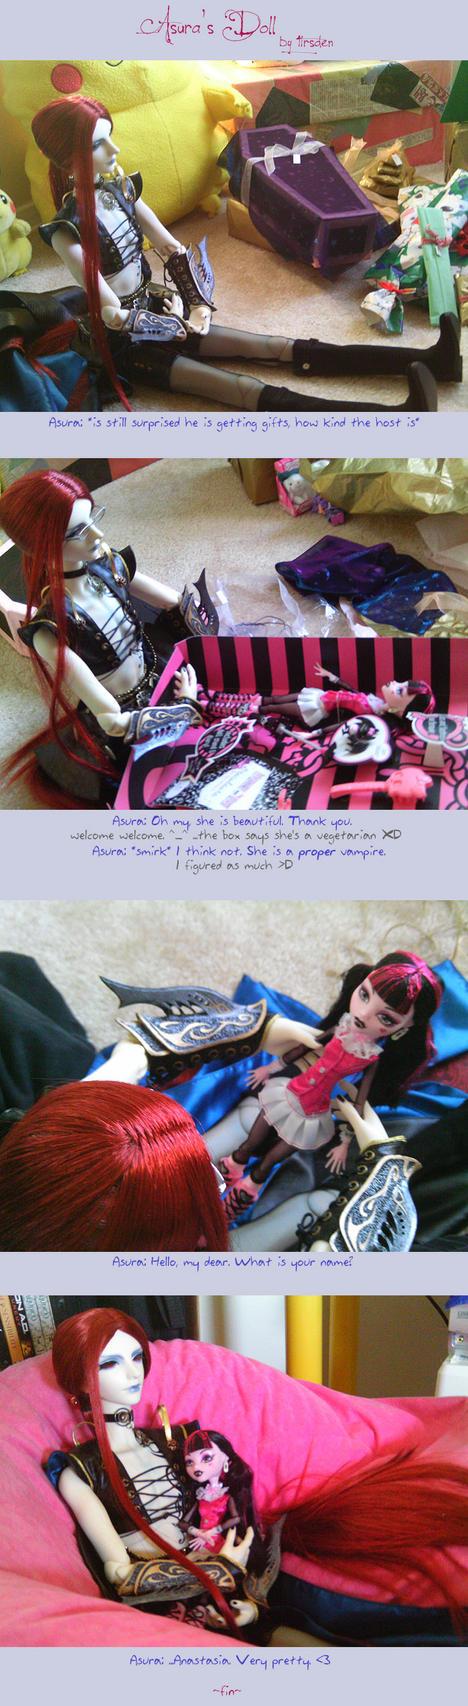 Asura's Doll by tirsden